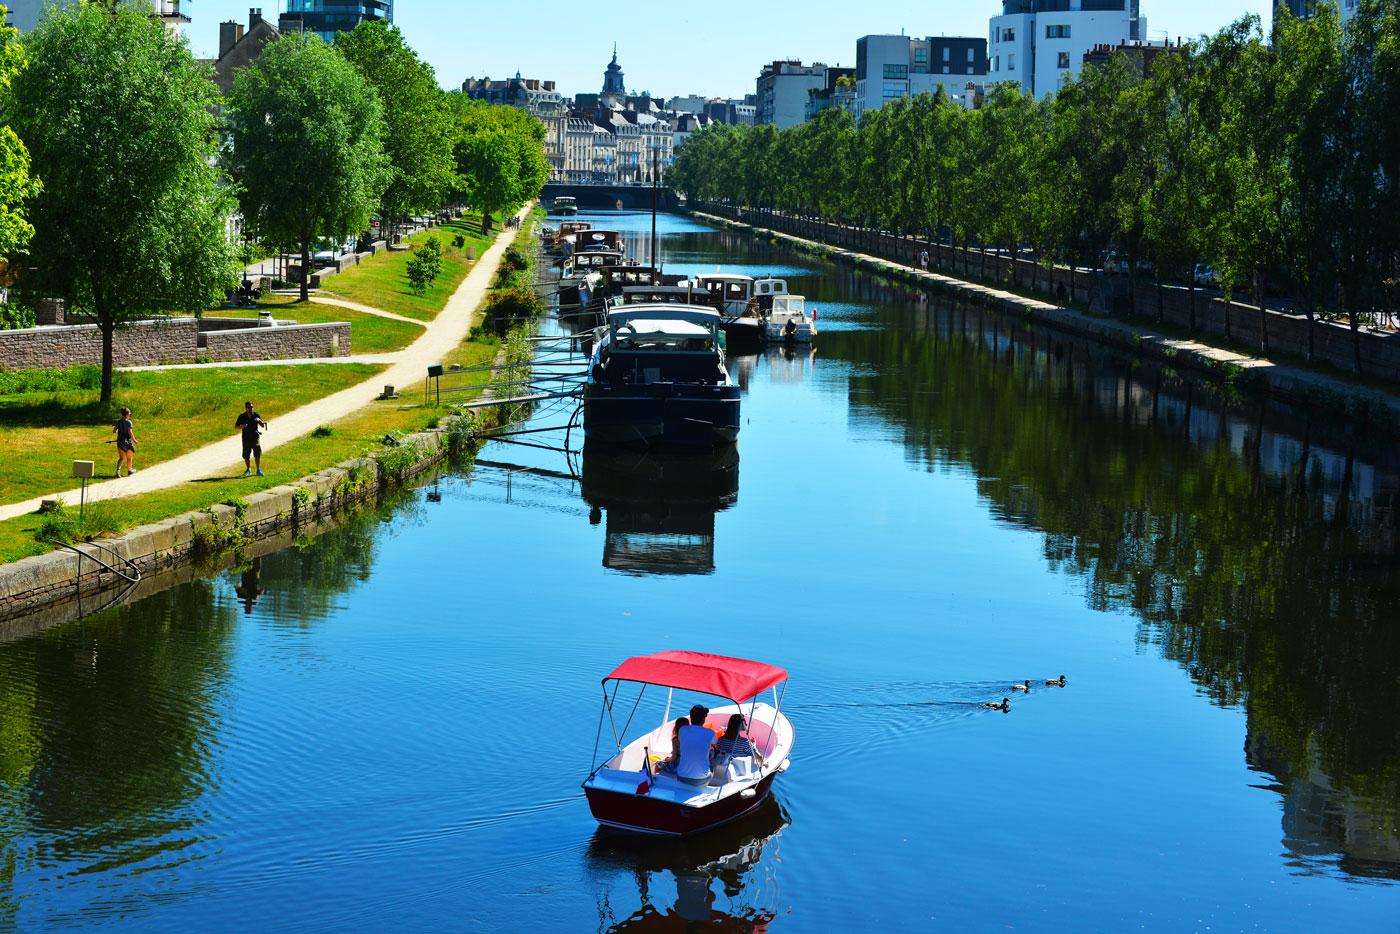 Boat trip in Rennes